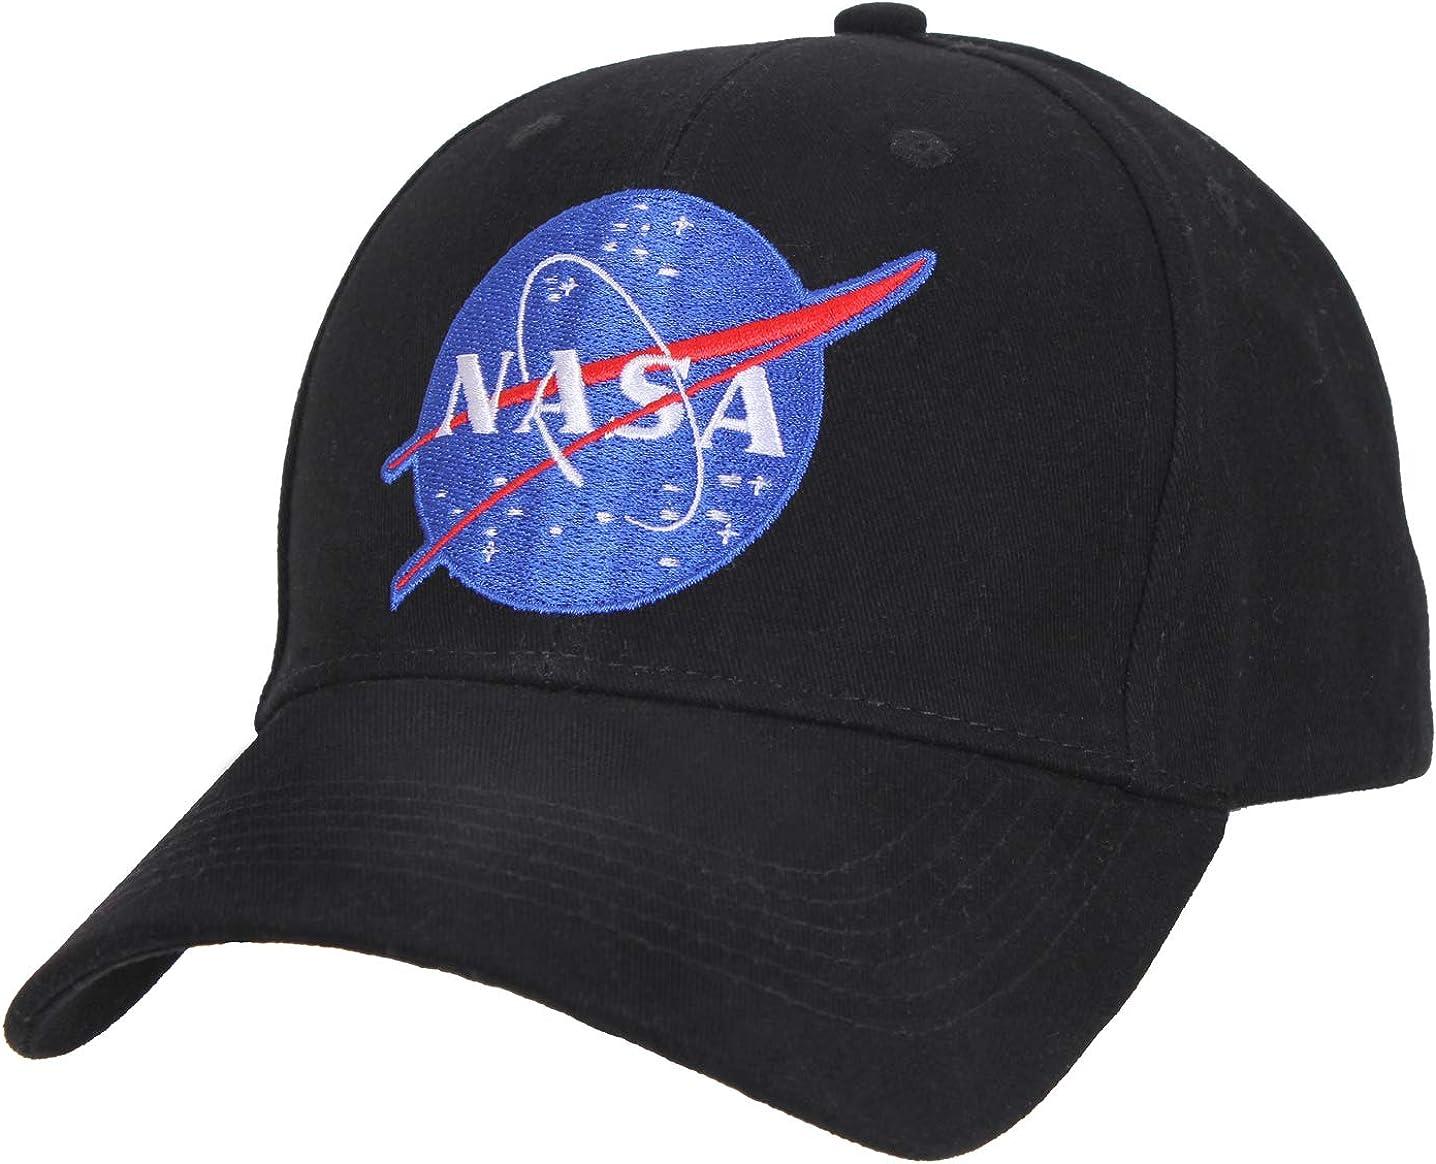 Rothco NASA Low Pro Cap Black: Clothing